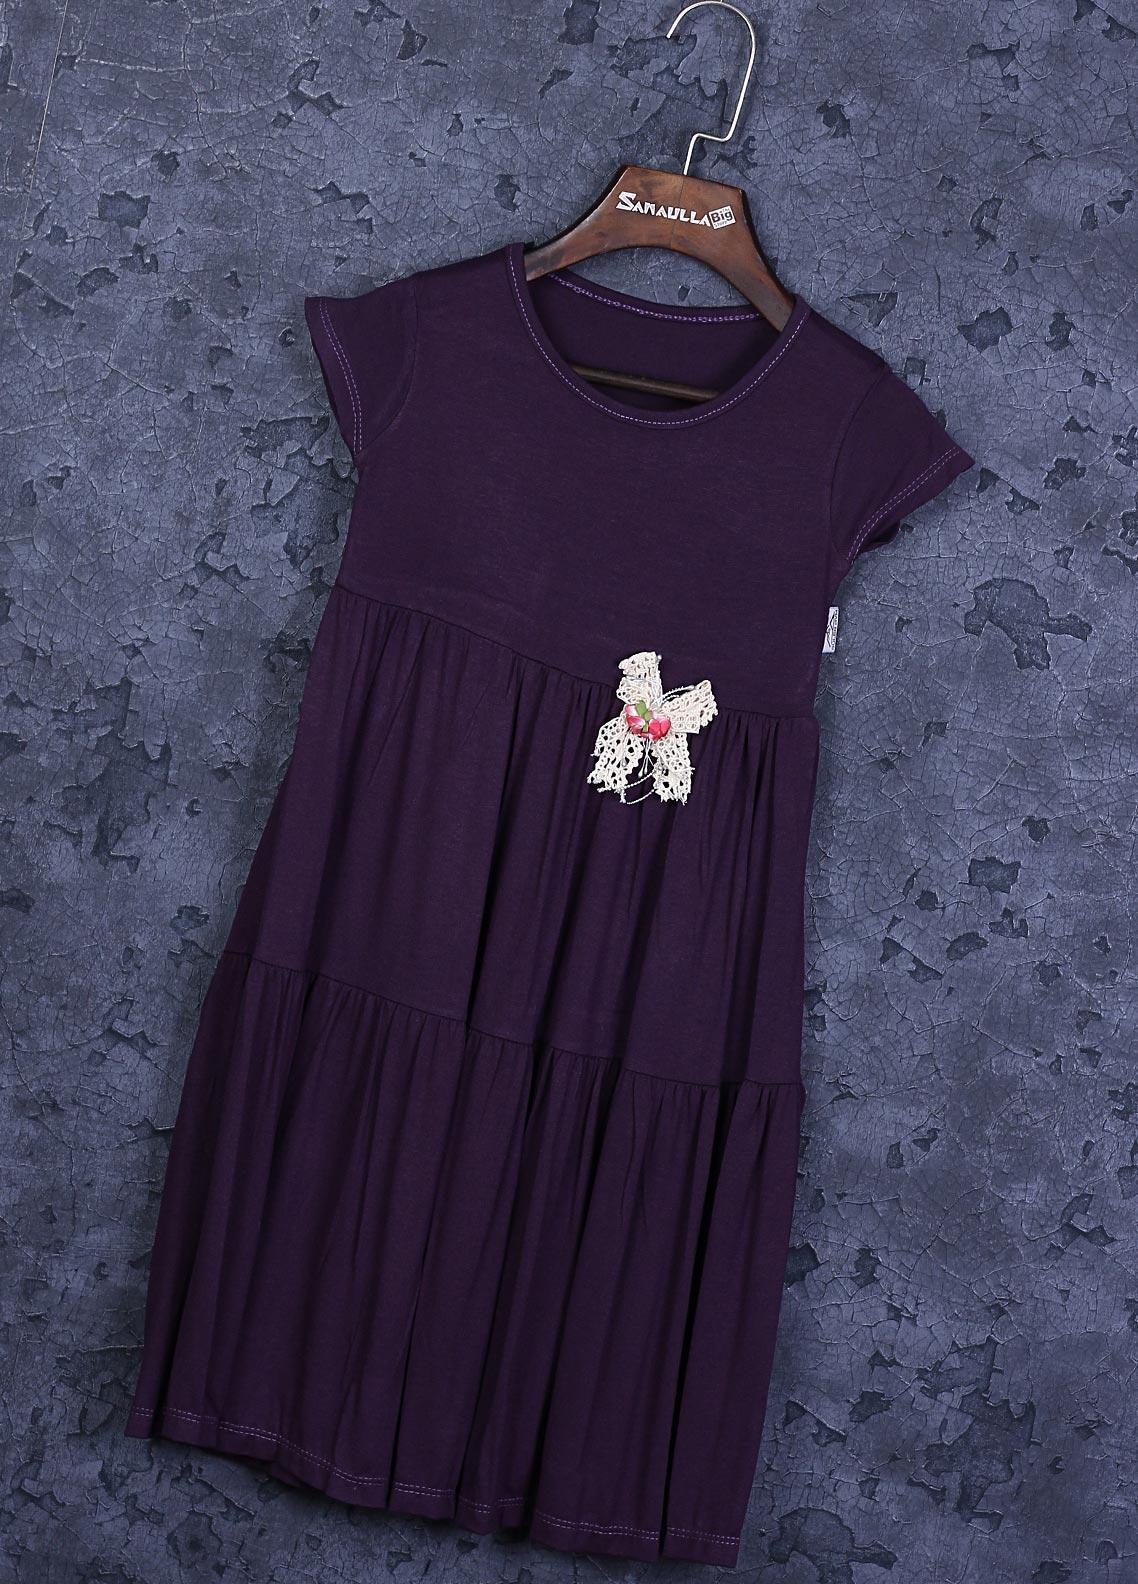 Sanaulla Exclusive Range Cotton Fancy Girls Frocks -  22772 Purple